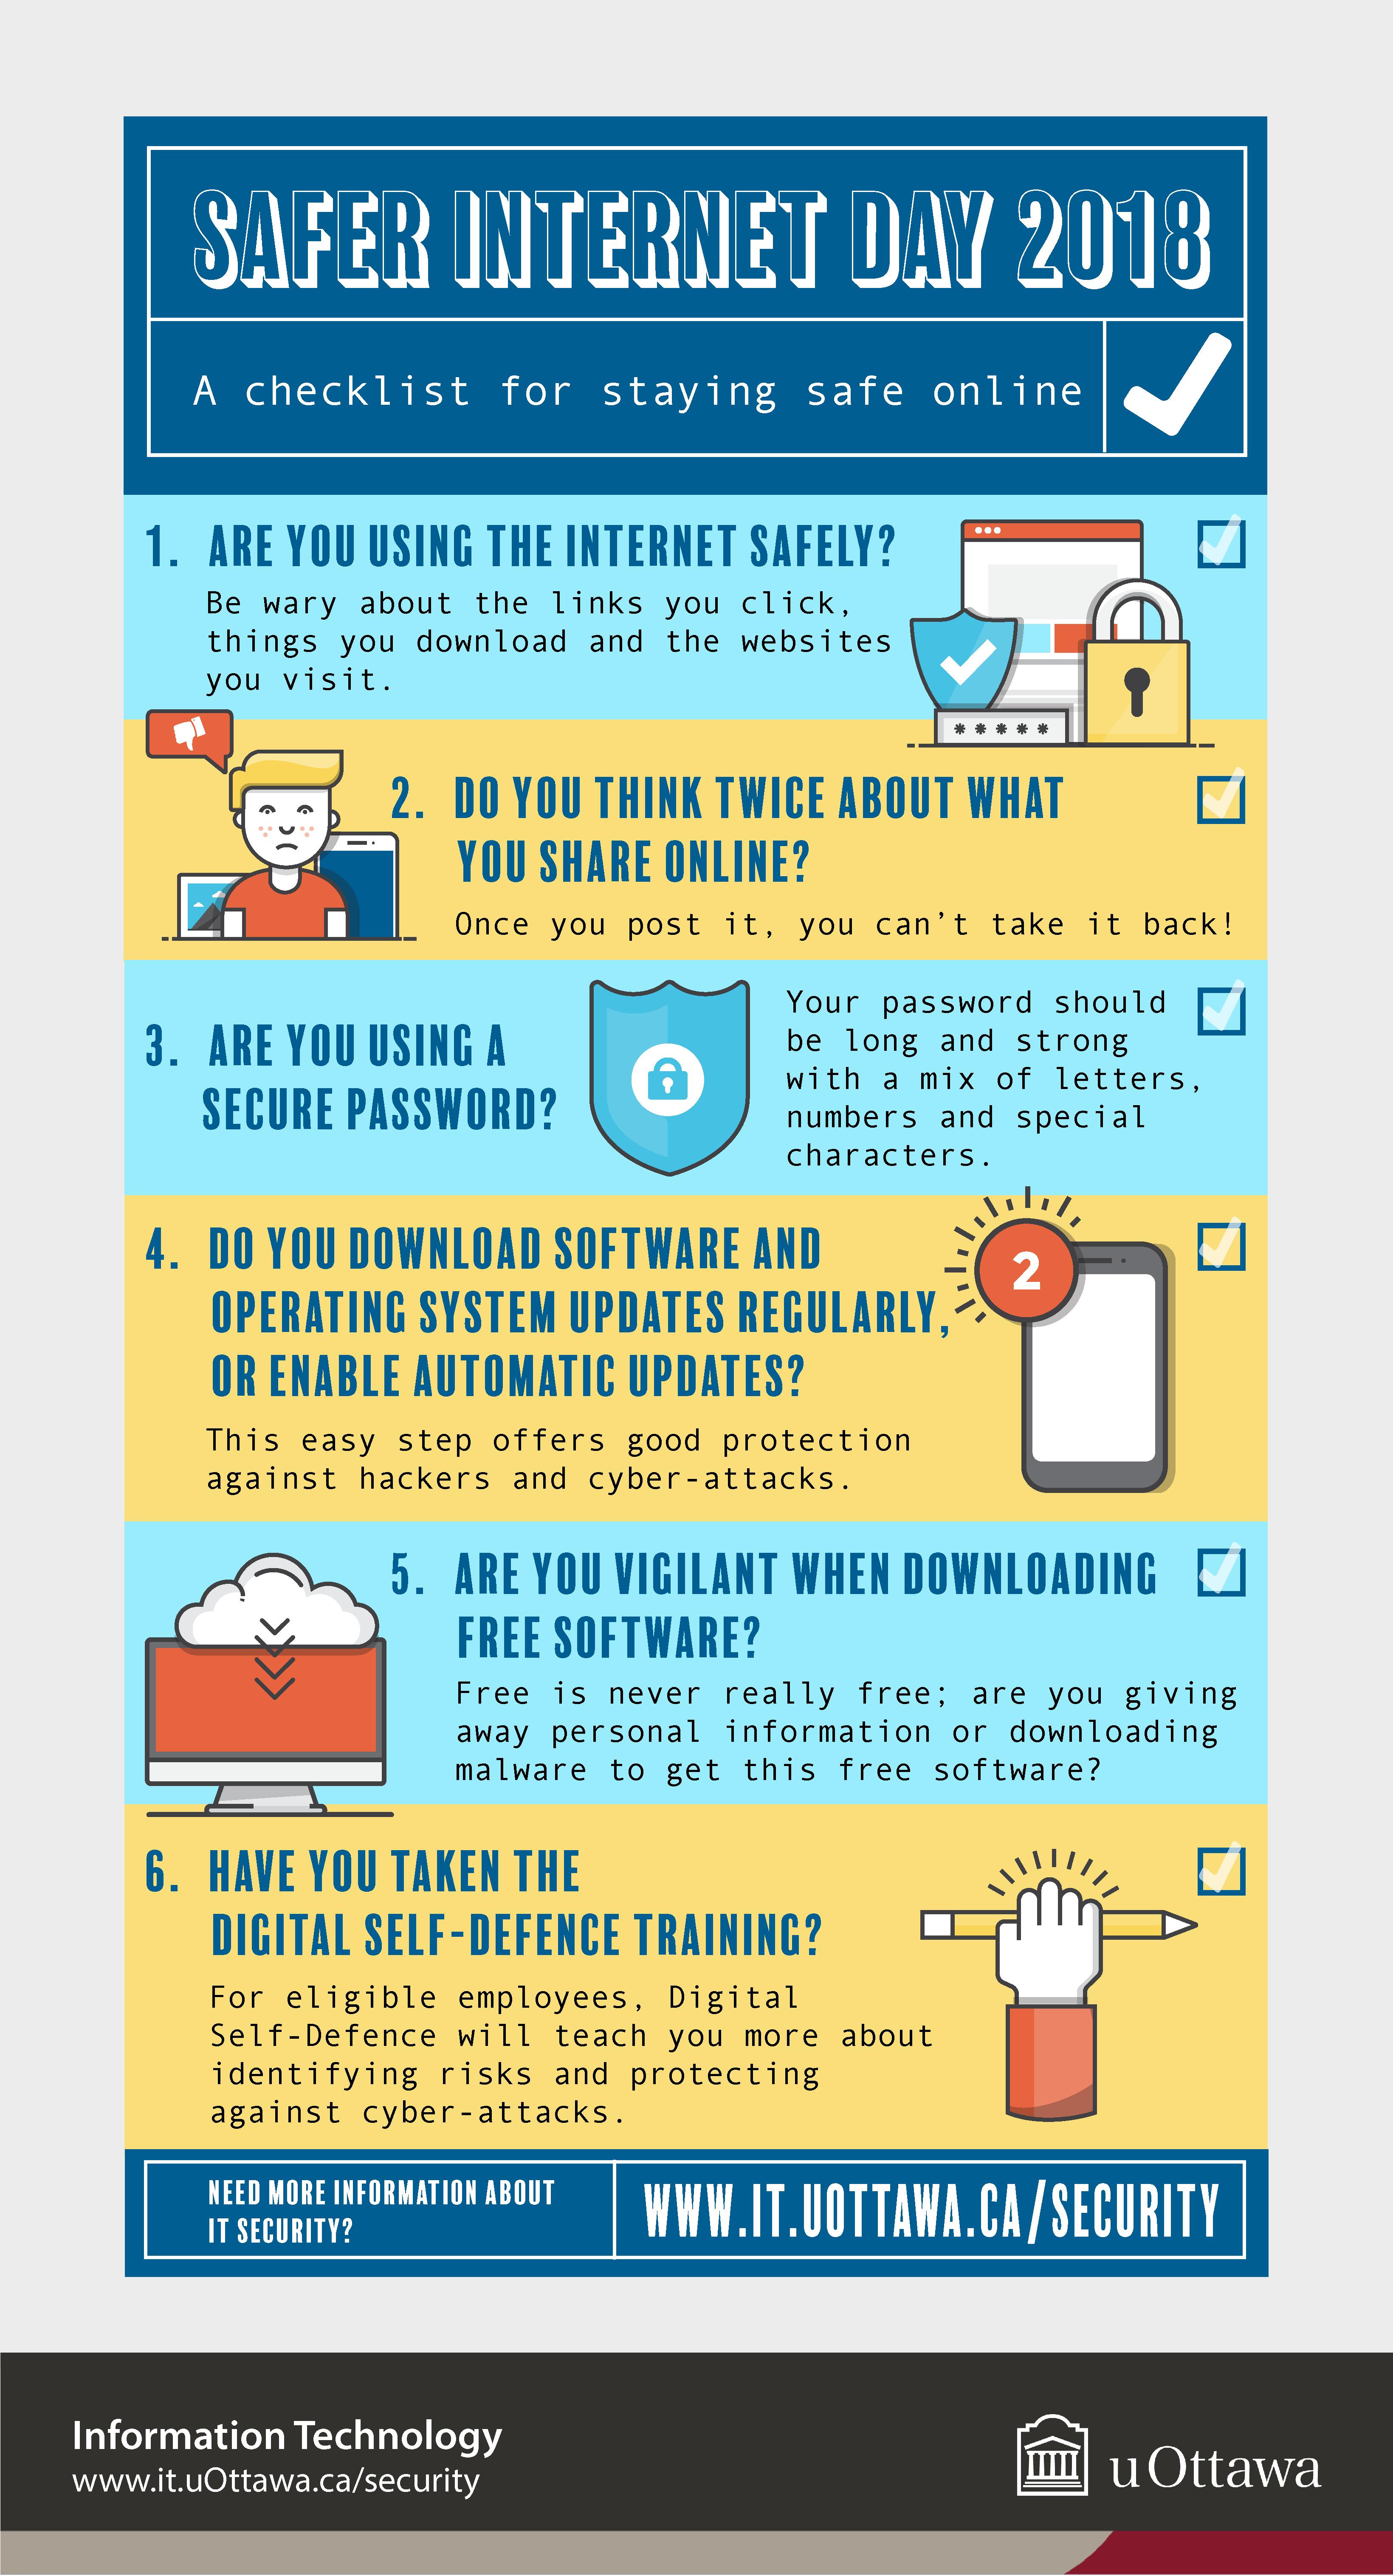 Safer Internet Day 2018 infographic, text version below